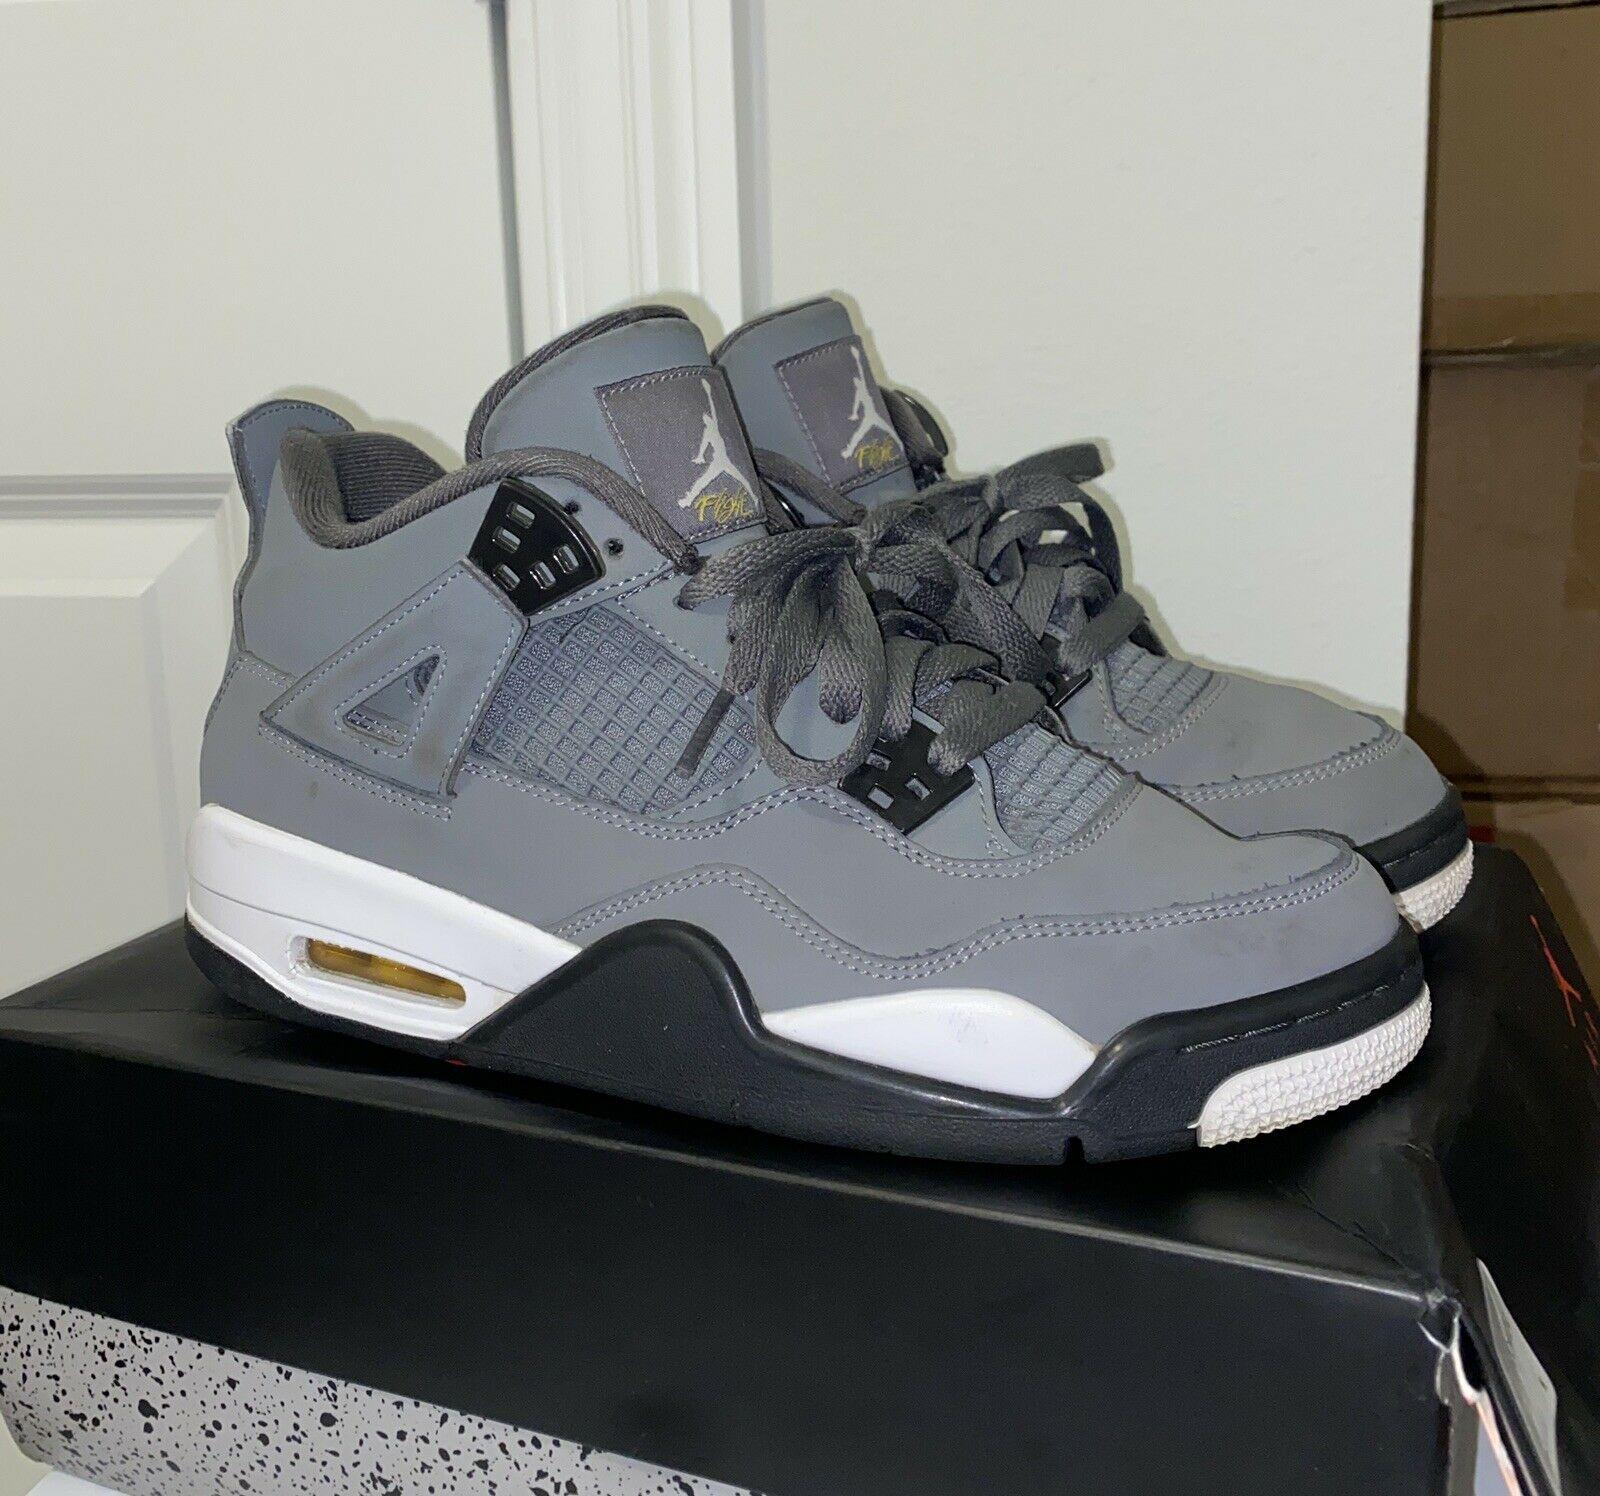 Jordan 4 Retro Cool Grey 2019 GS